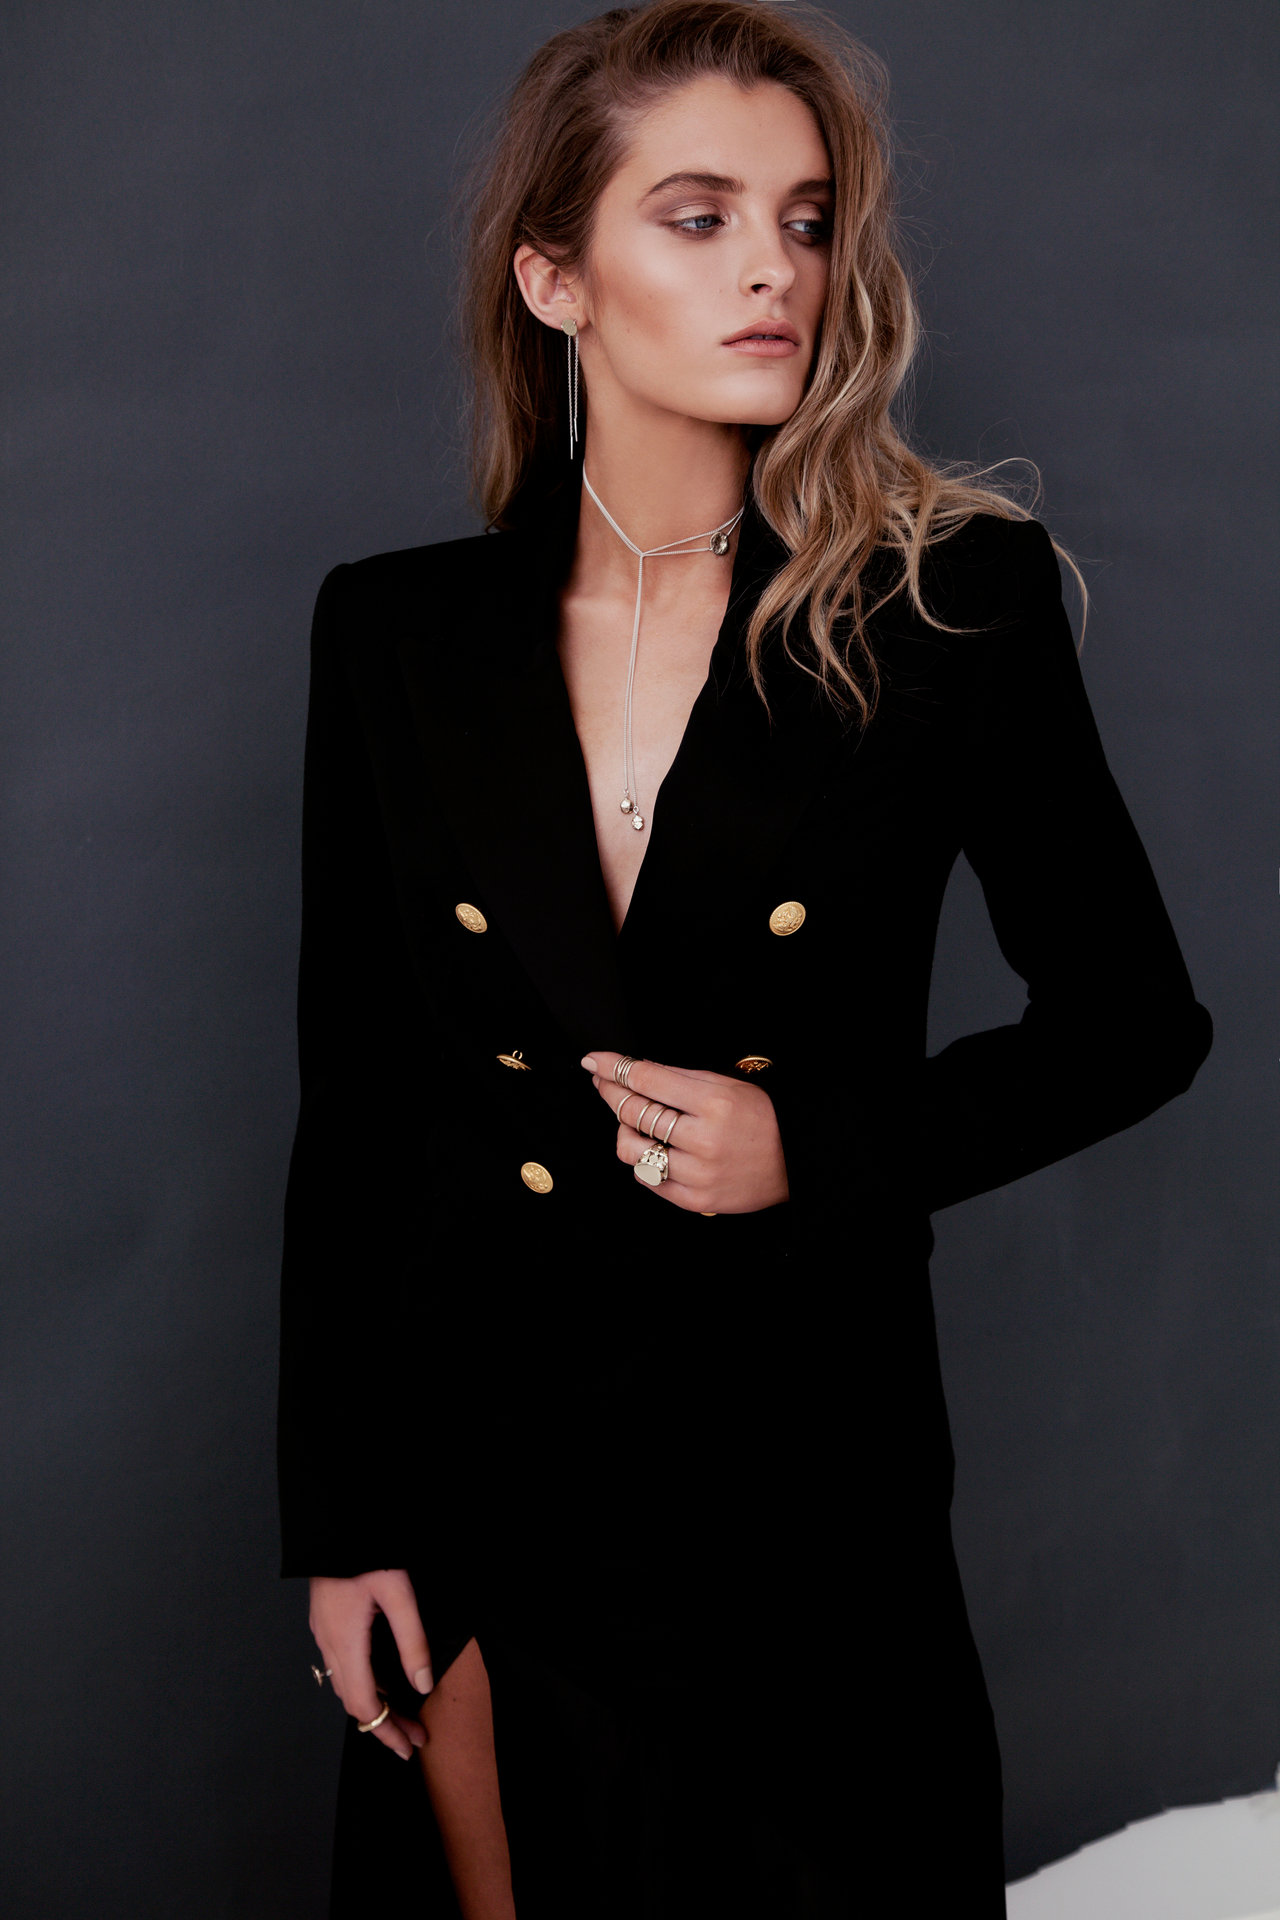 Fashion stylist jobs melbourne 39